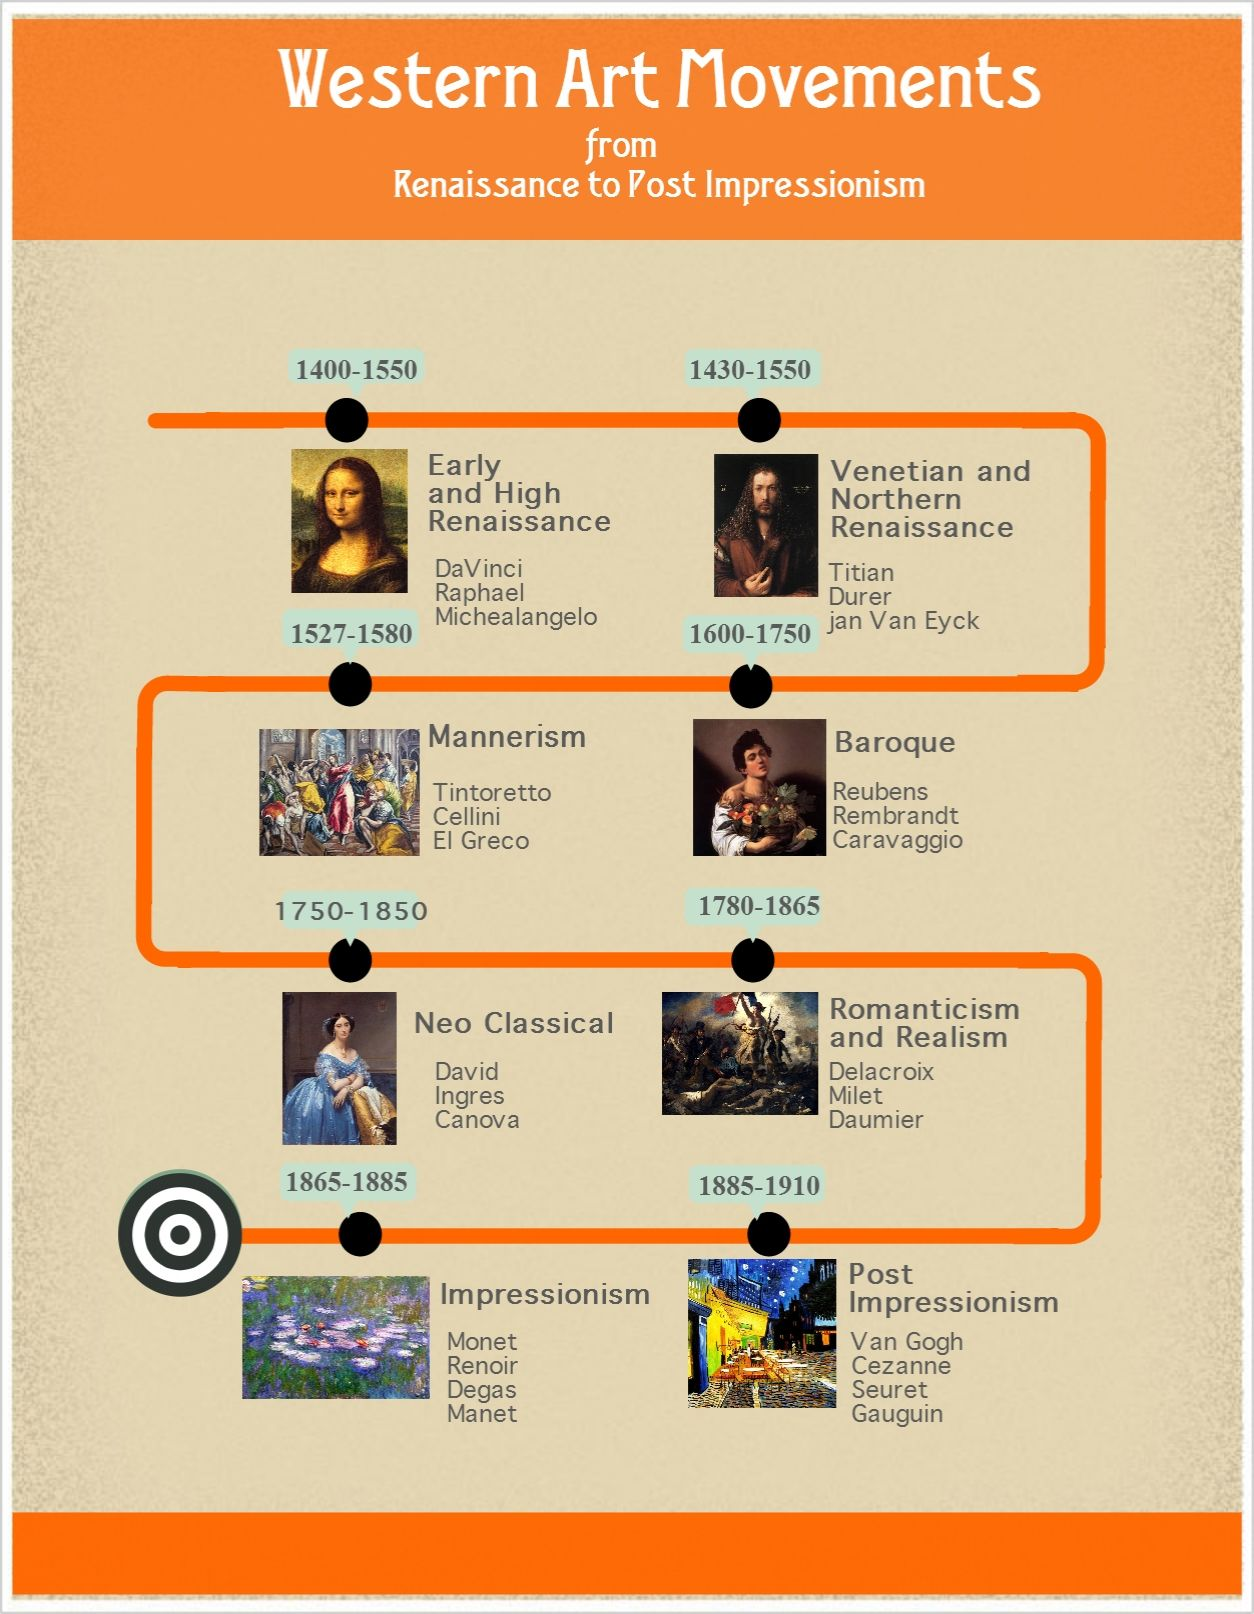 Janson Art History Timeline.png (1500×987) | Art History Timeline ...